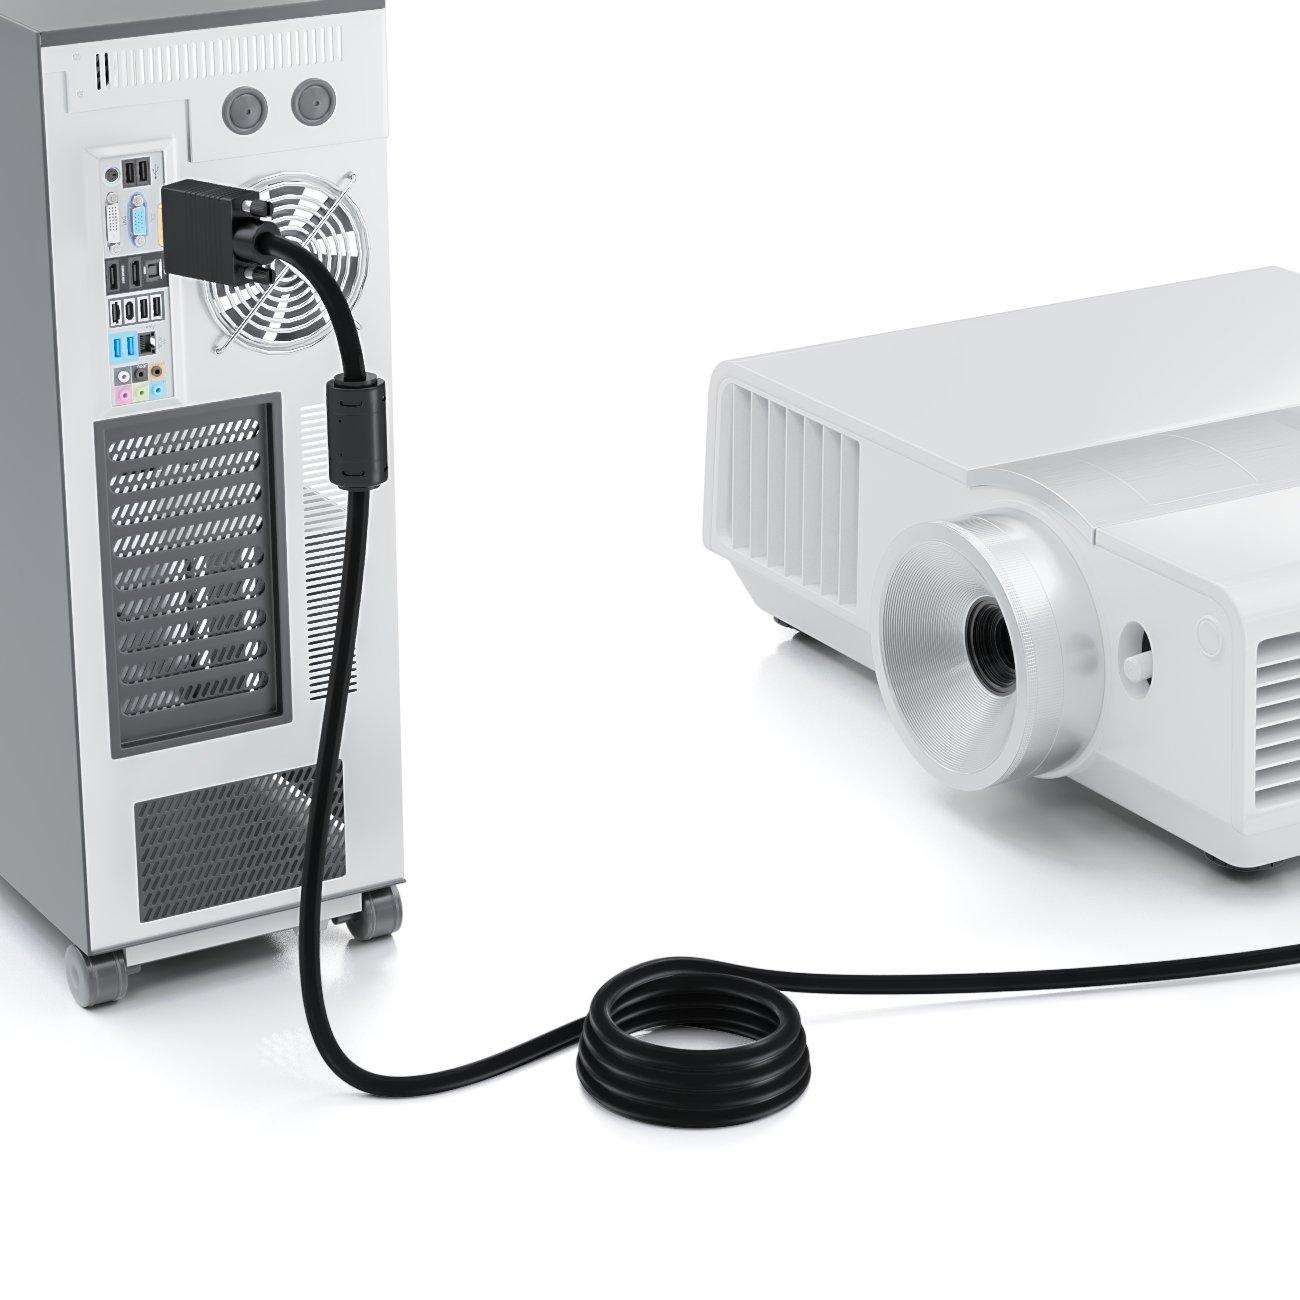 deleyCON 0,5m VGA Kabel 15pol - S-VGA Monitorkabel: Amazon.de ...